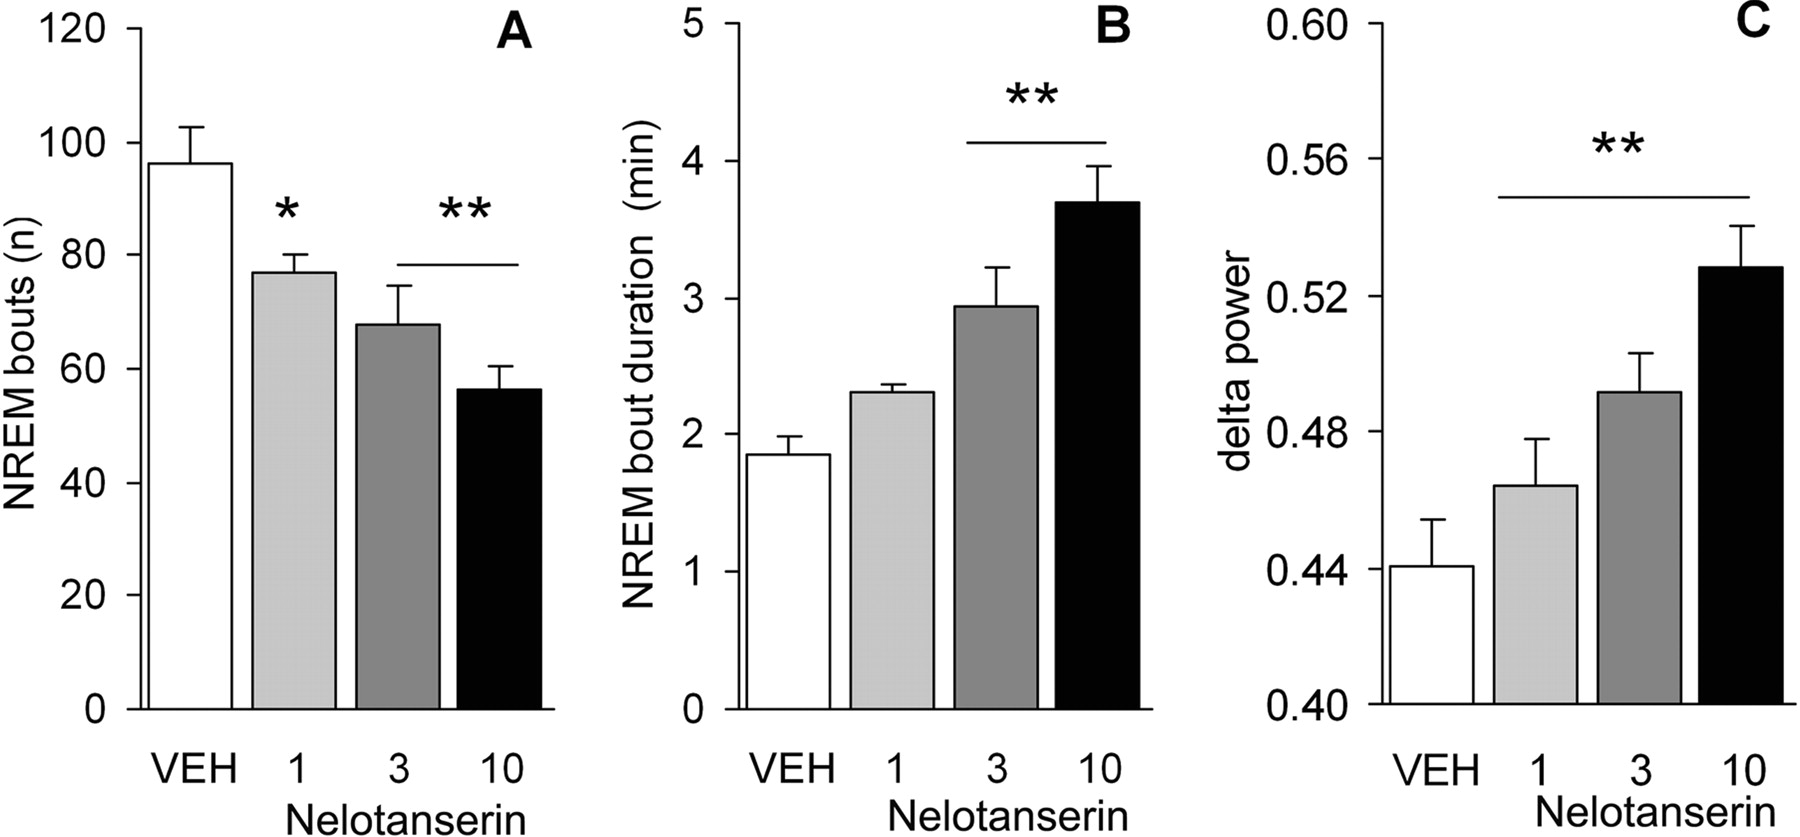 Nelotanserin, a Novel Selective Human 5-Hydroxytryptamine2A